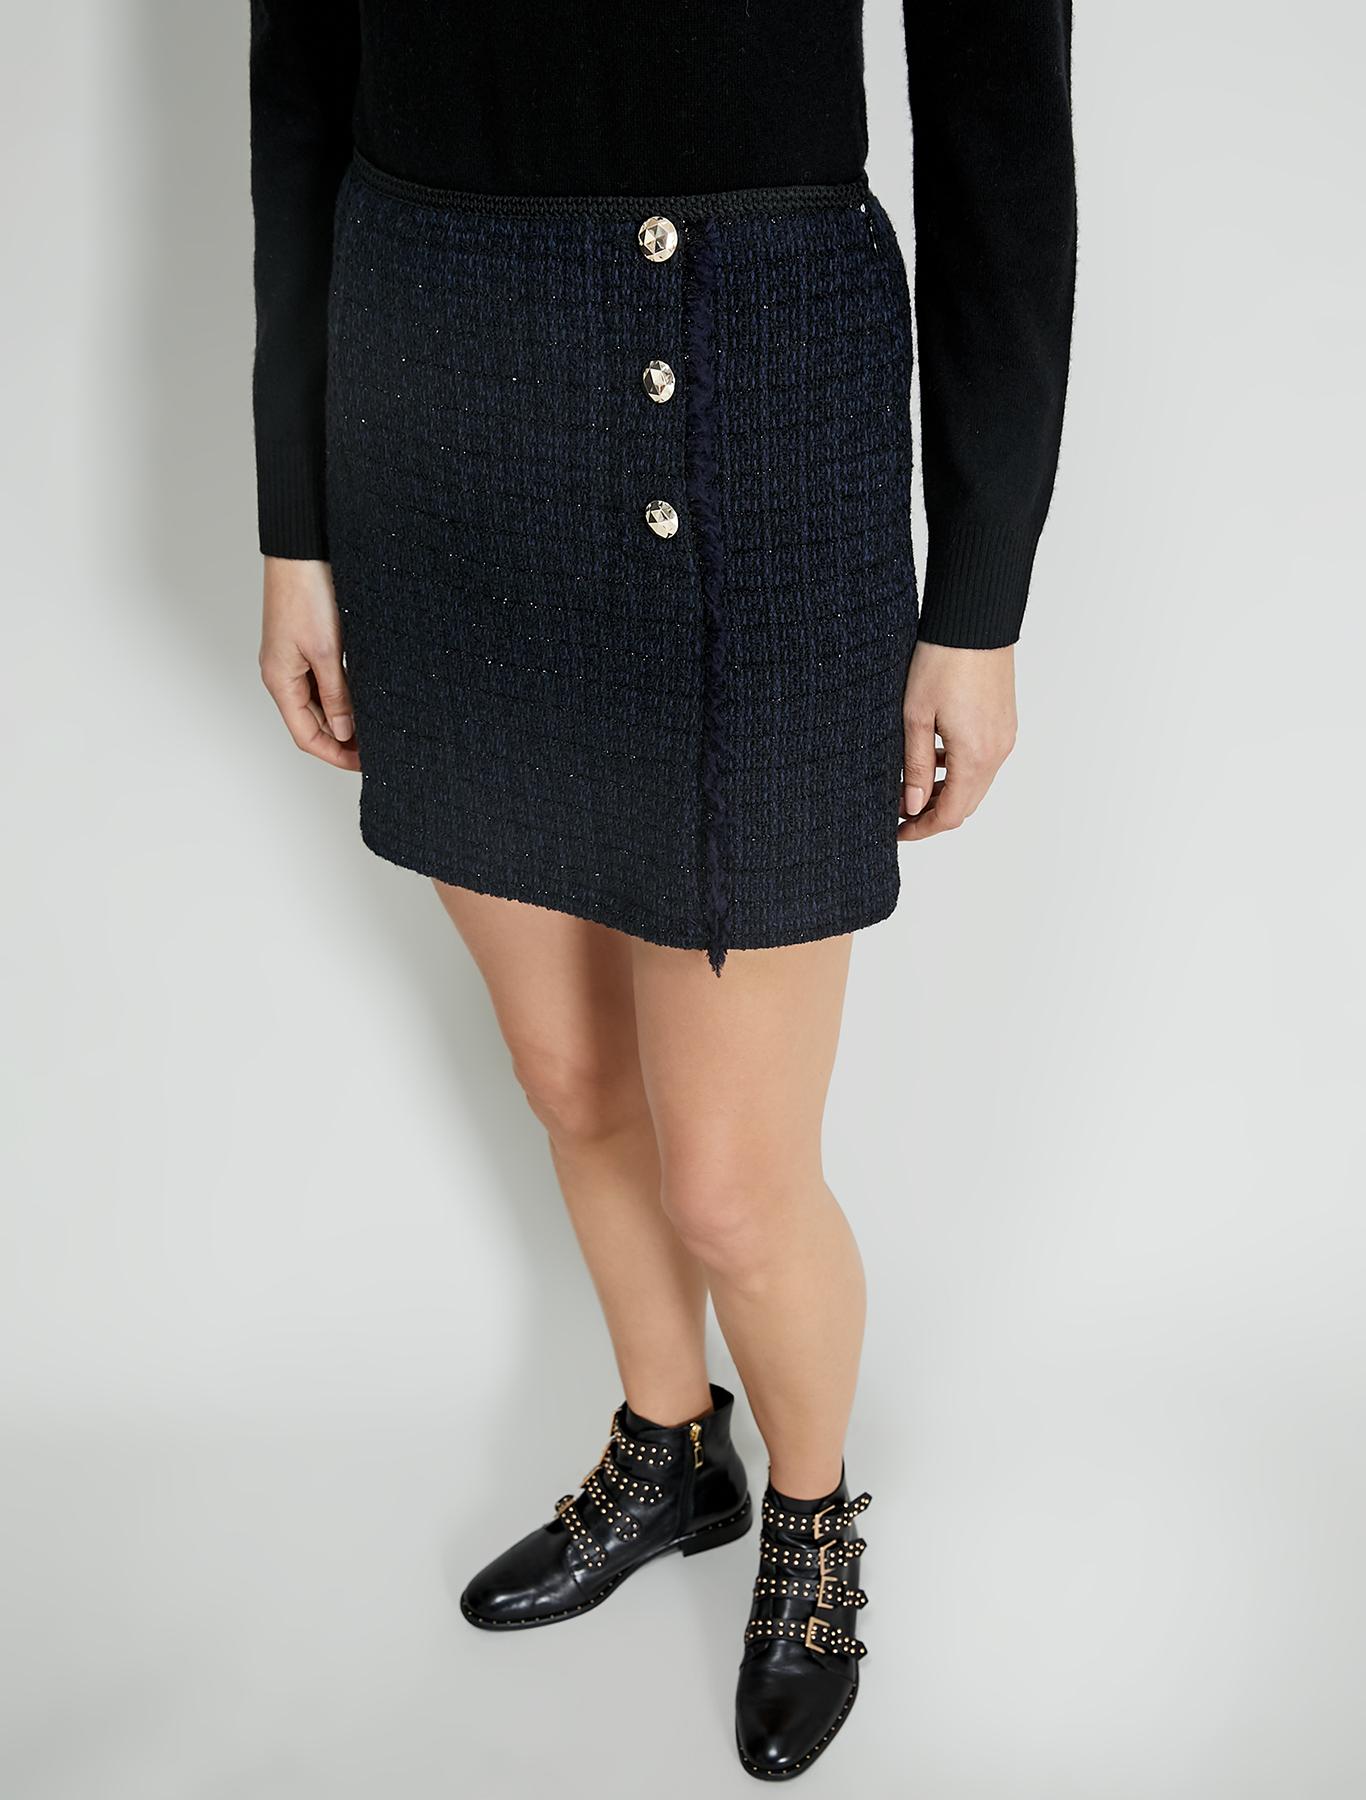 Lamé basketweave mini skirt - black pattern - pennyblack